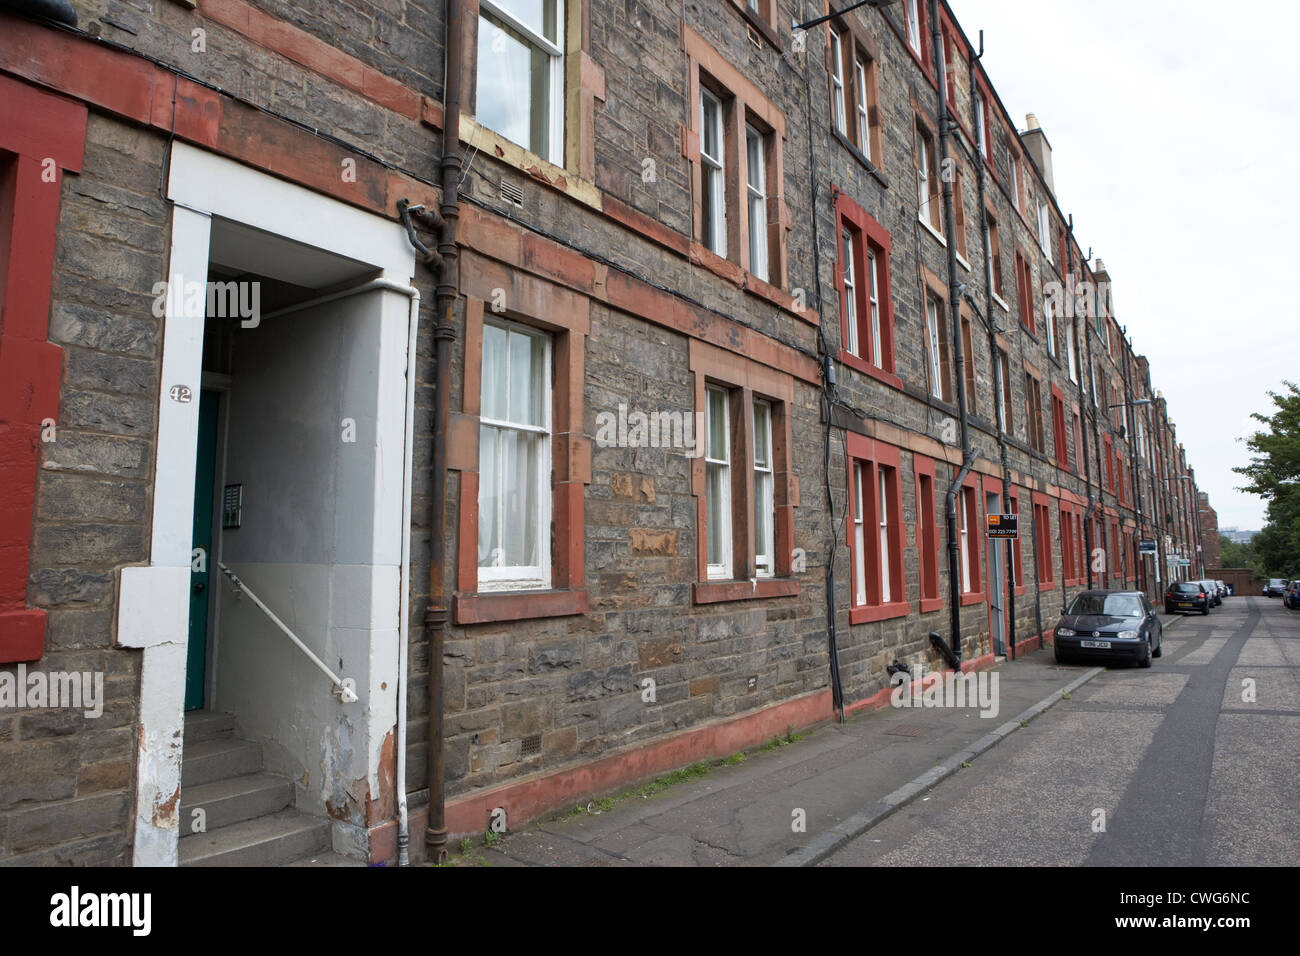 Tenement Houses Now Apartments In Edinburgh, Scotland, Uk, United Kingdom